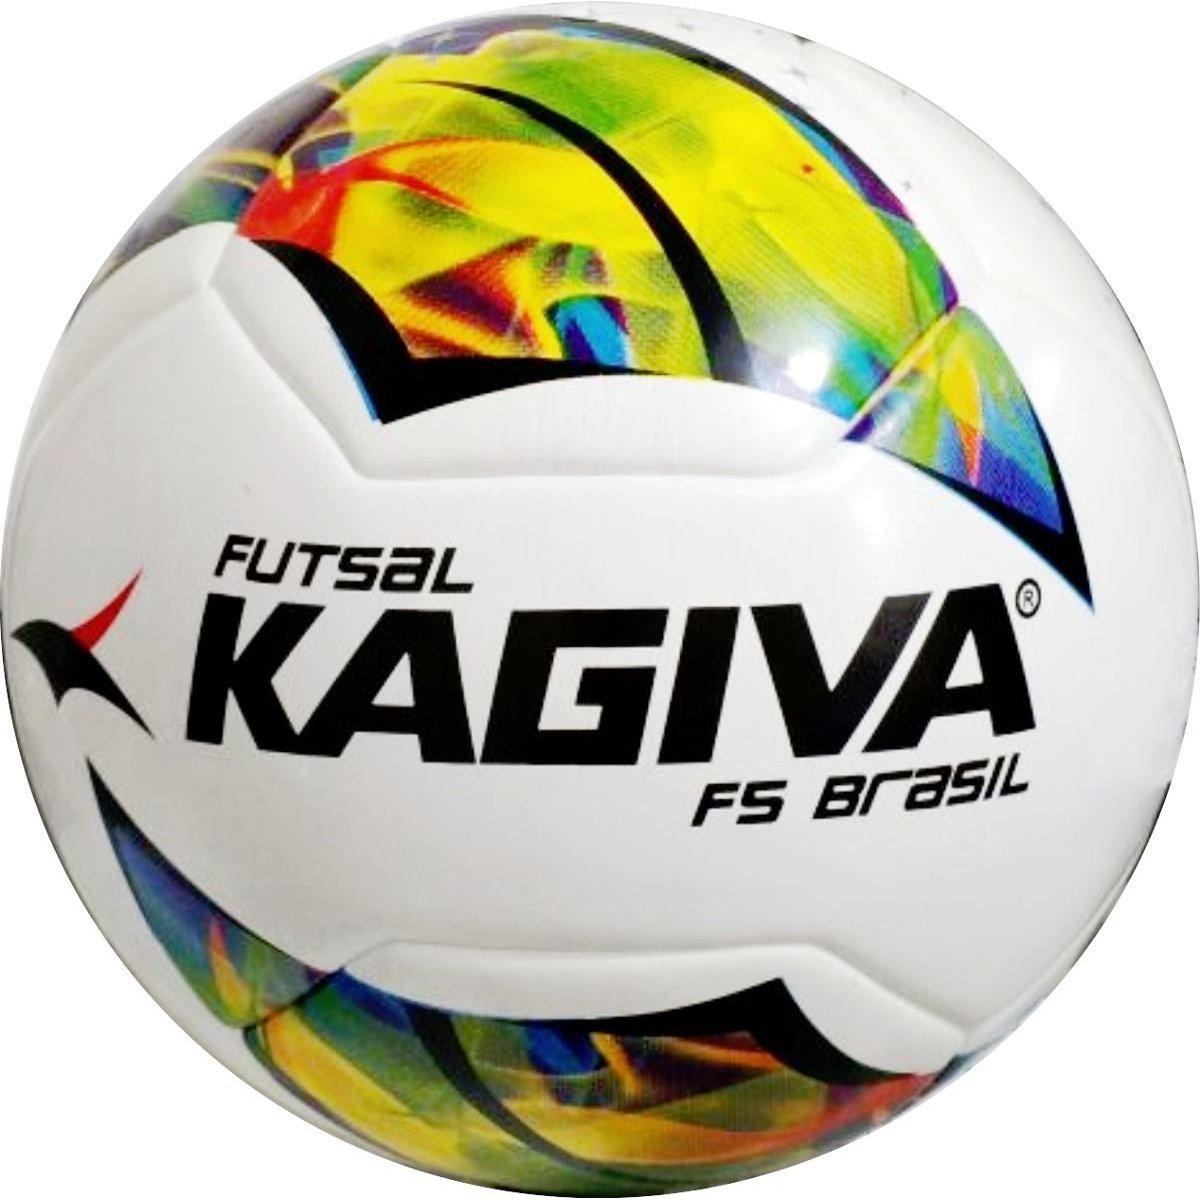 0a3f02426b76f Bola Futsal Kagiva F5 Pro - Compre Agora